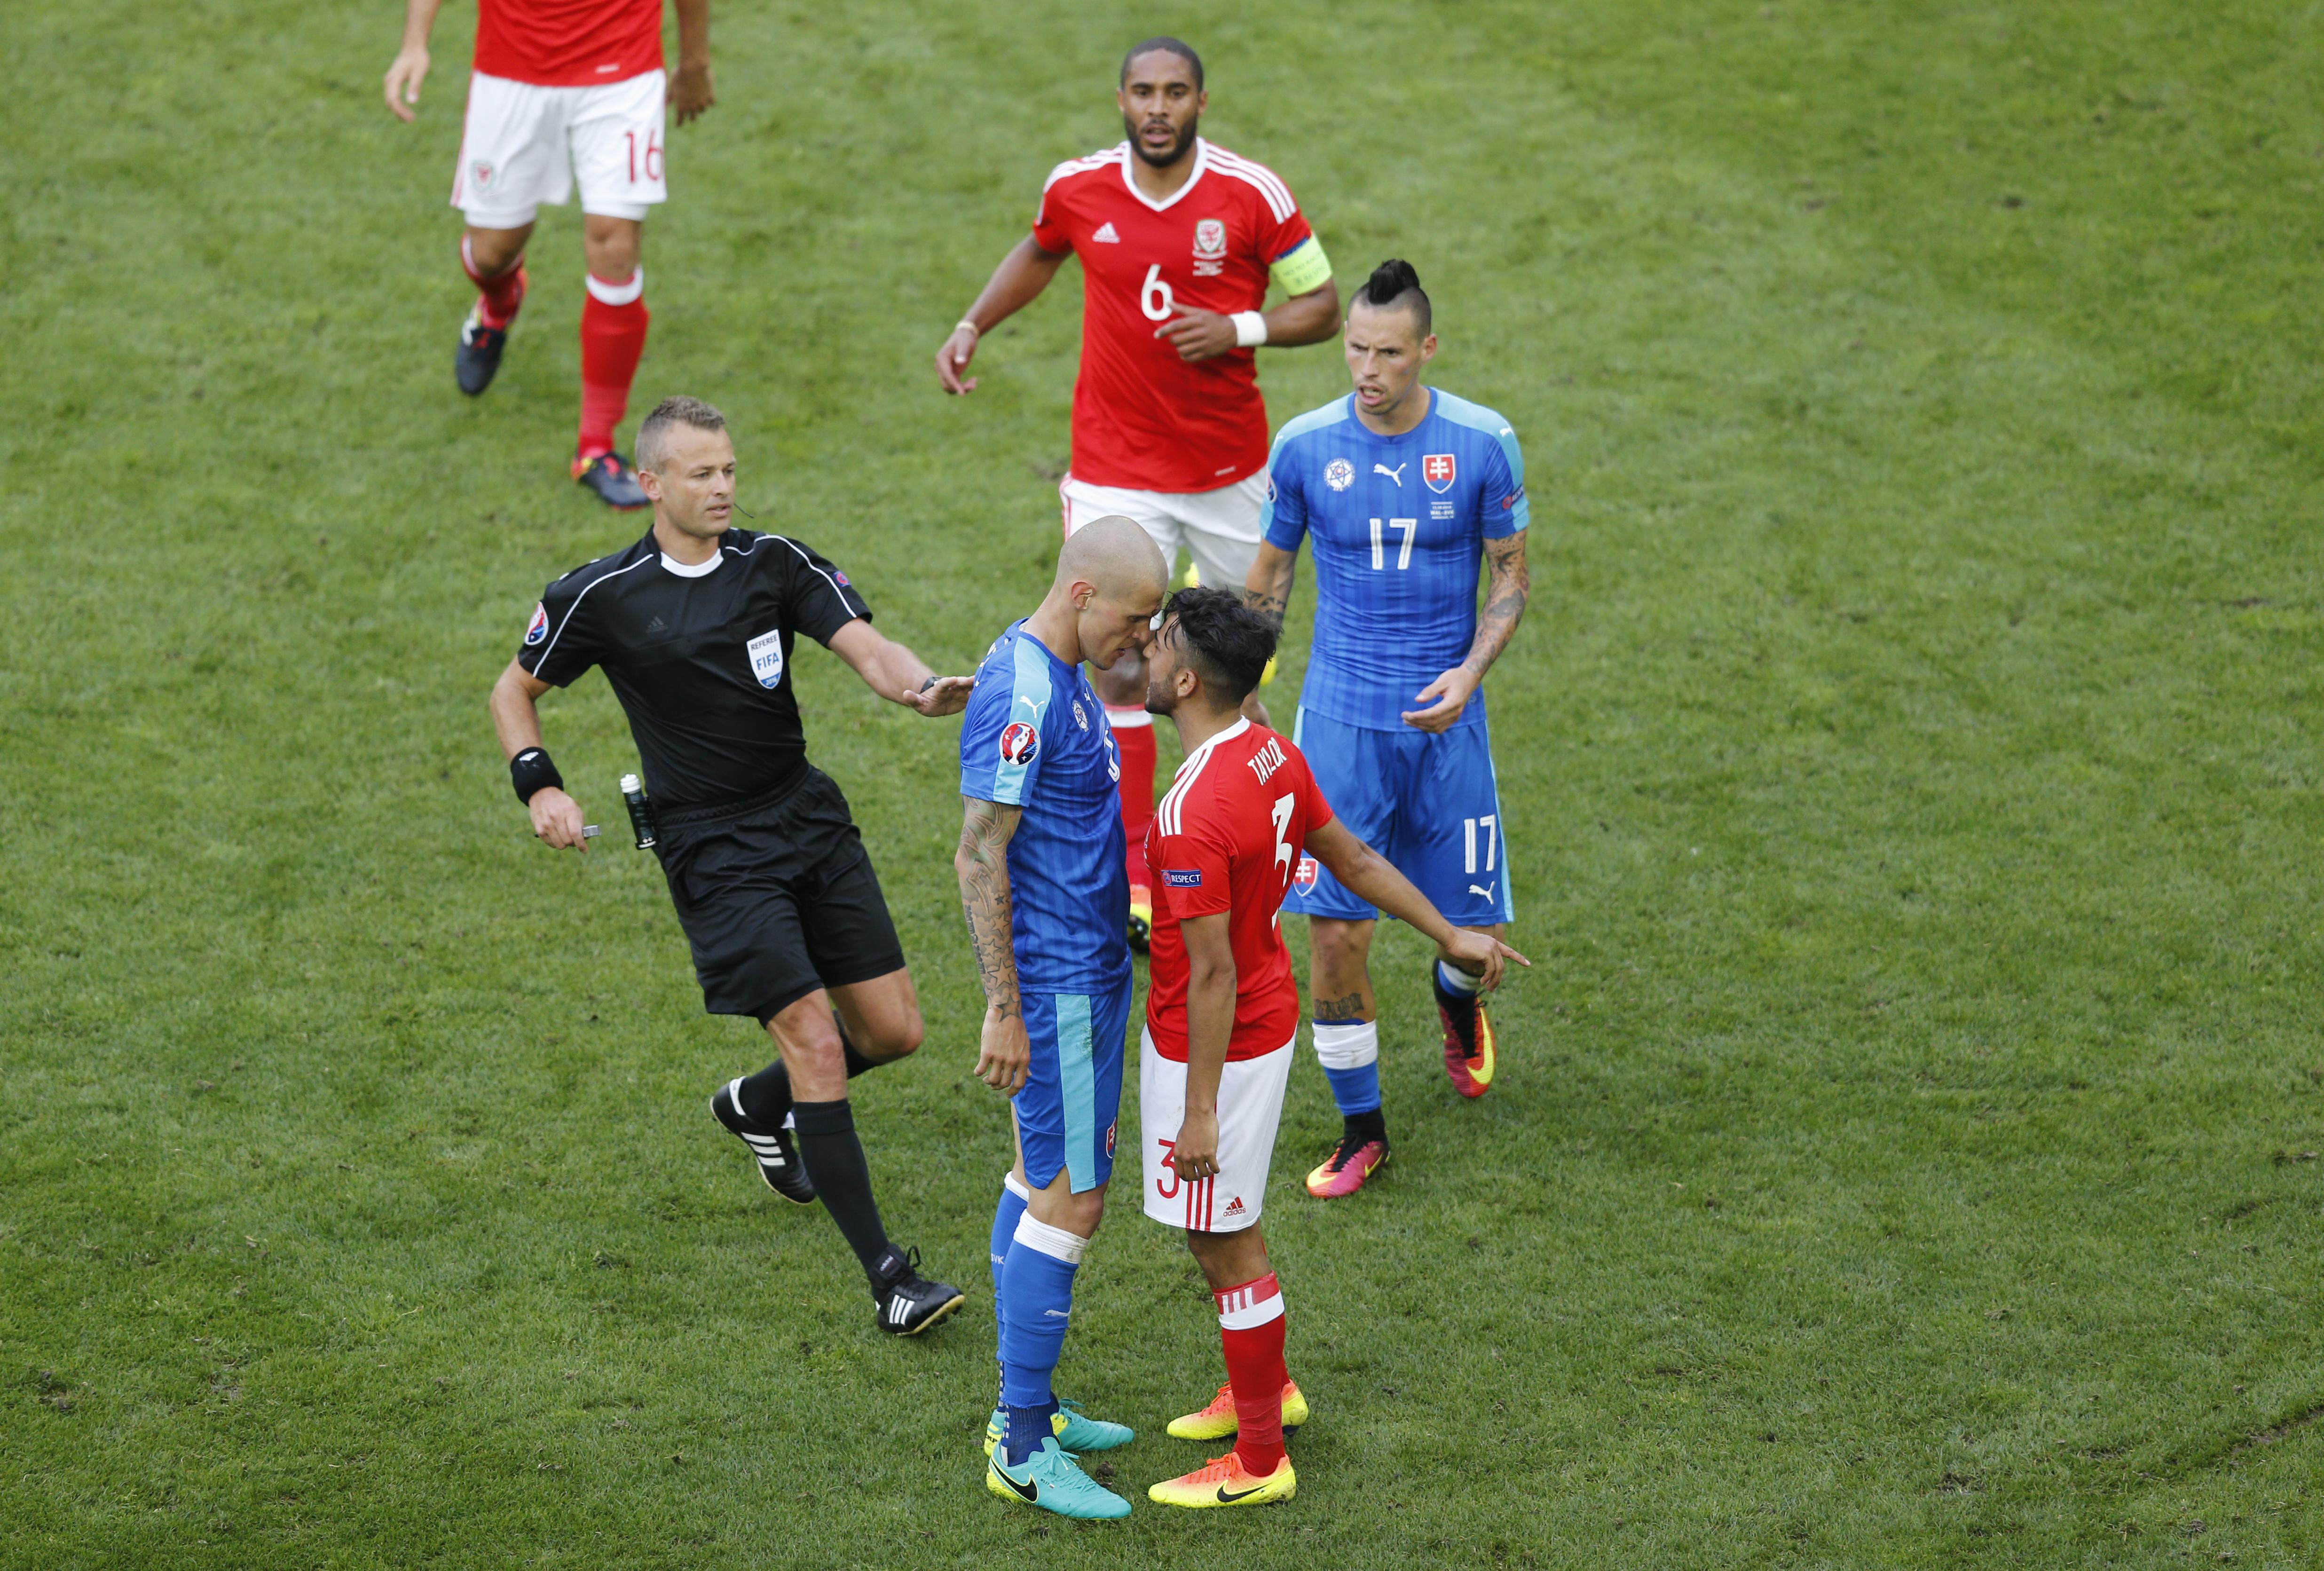 Slovakia's Martin Skrtel clashes with Wales' Neil Taylor. (Reuters/Regis Duvignau)